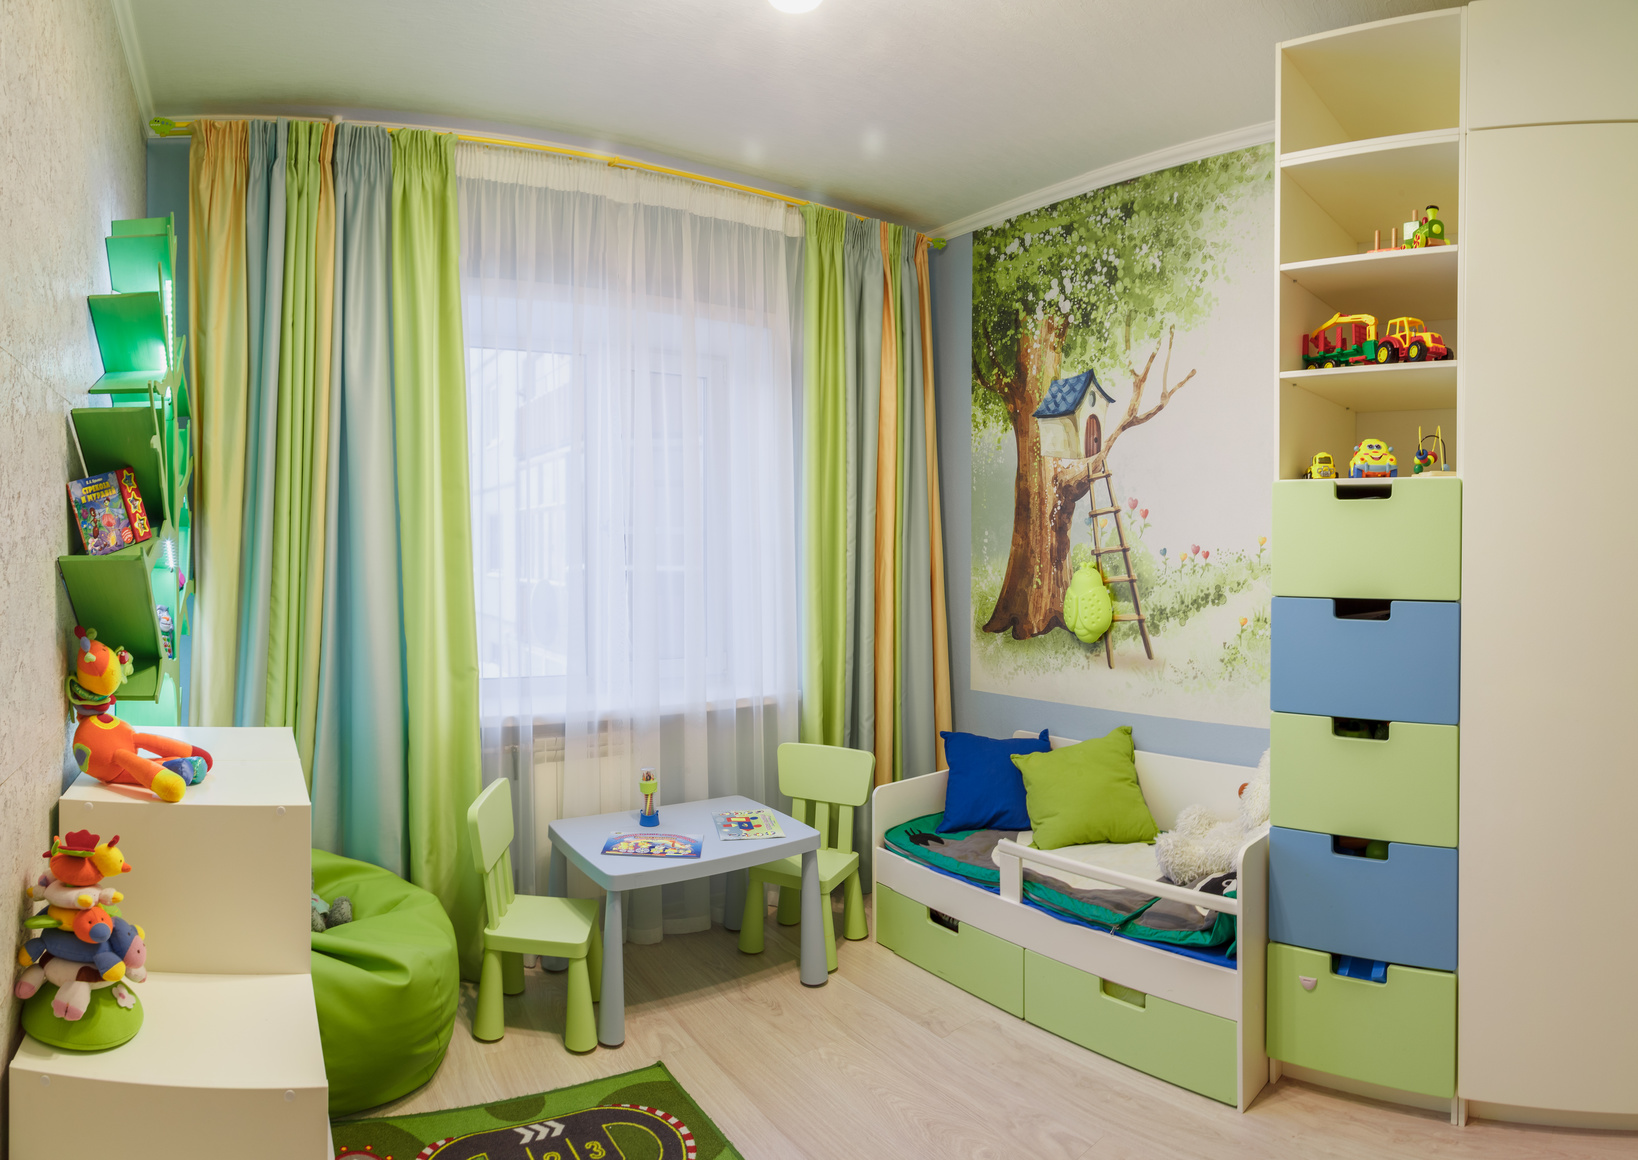 Bedroom decoration idea 2.jpg